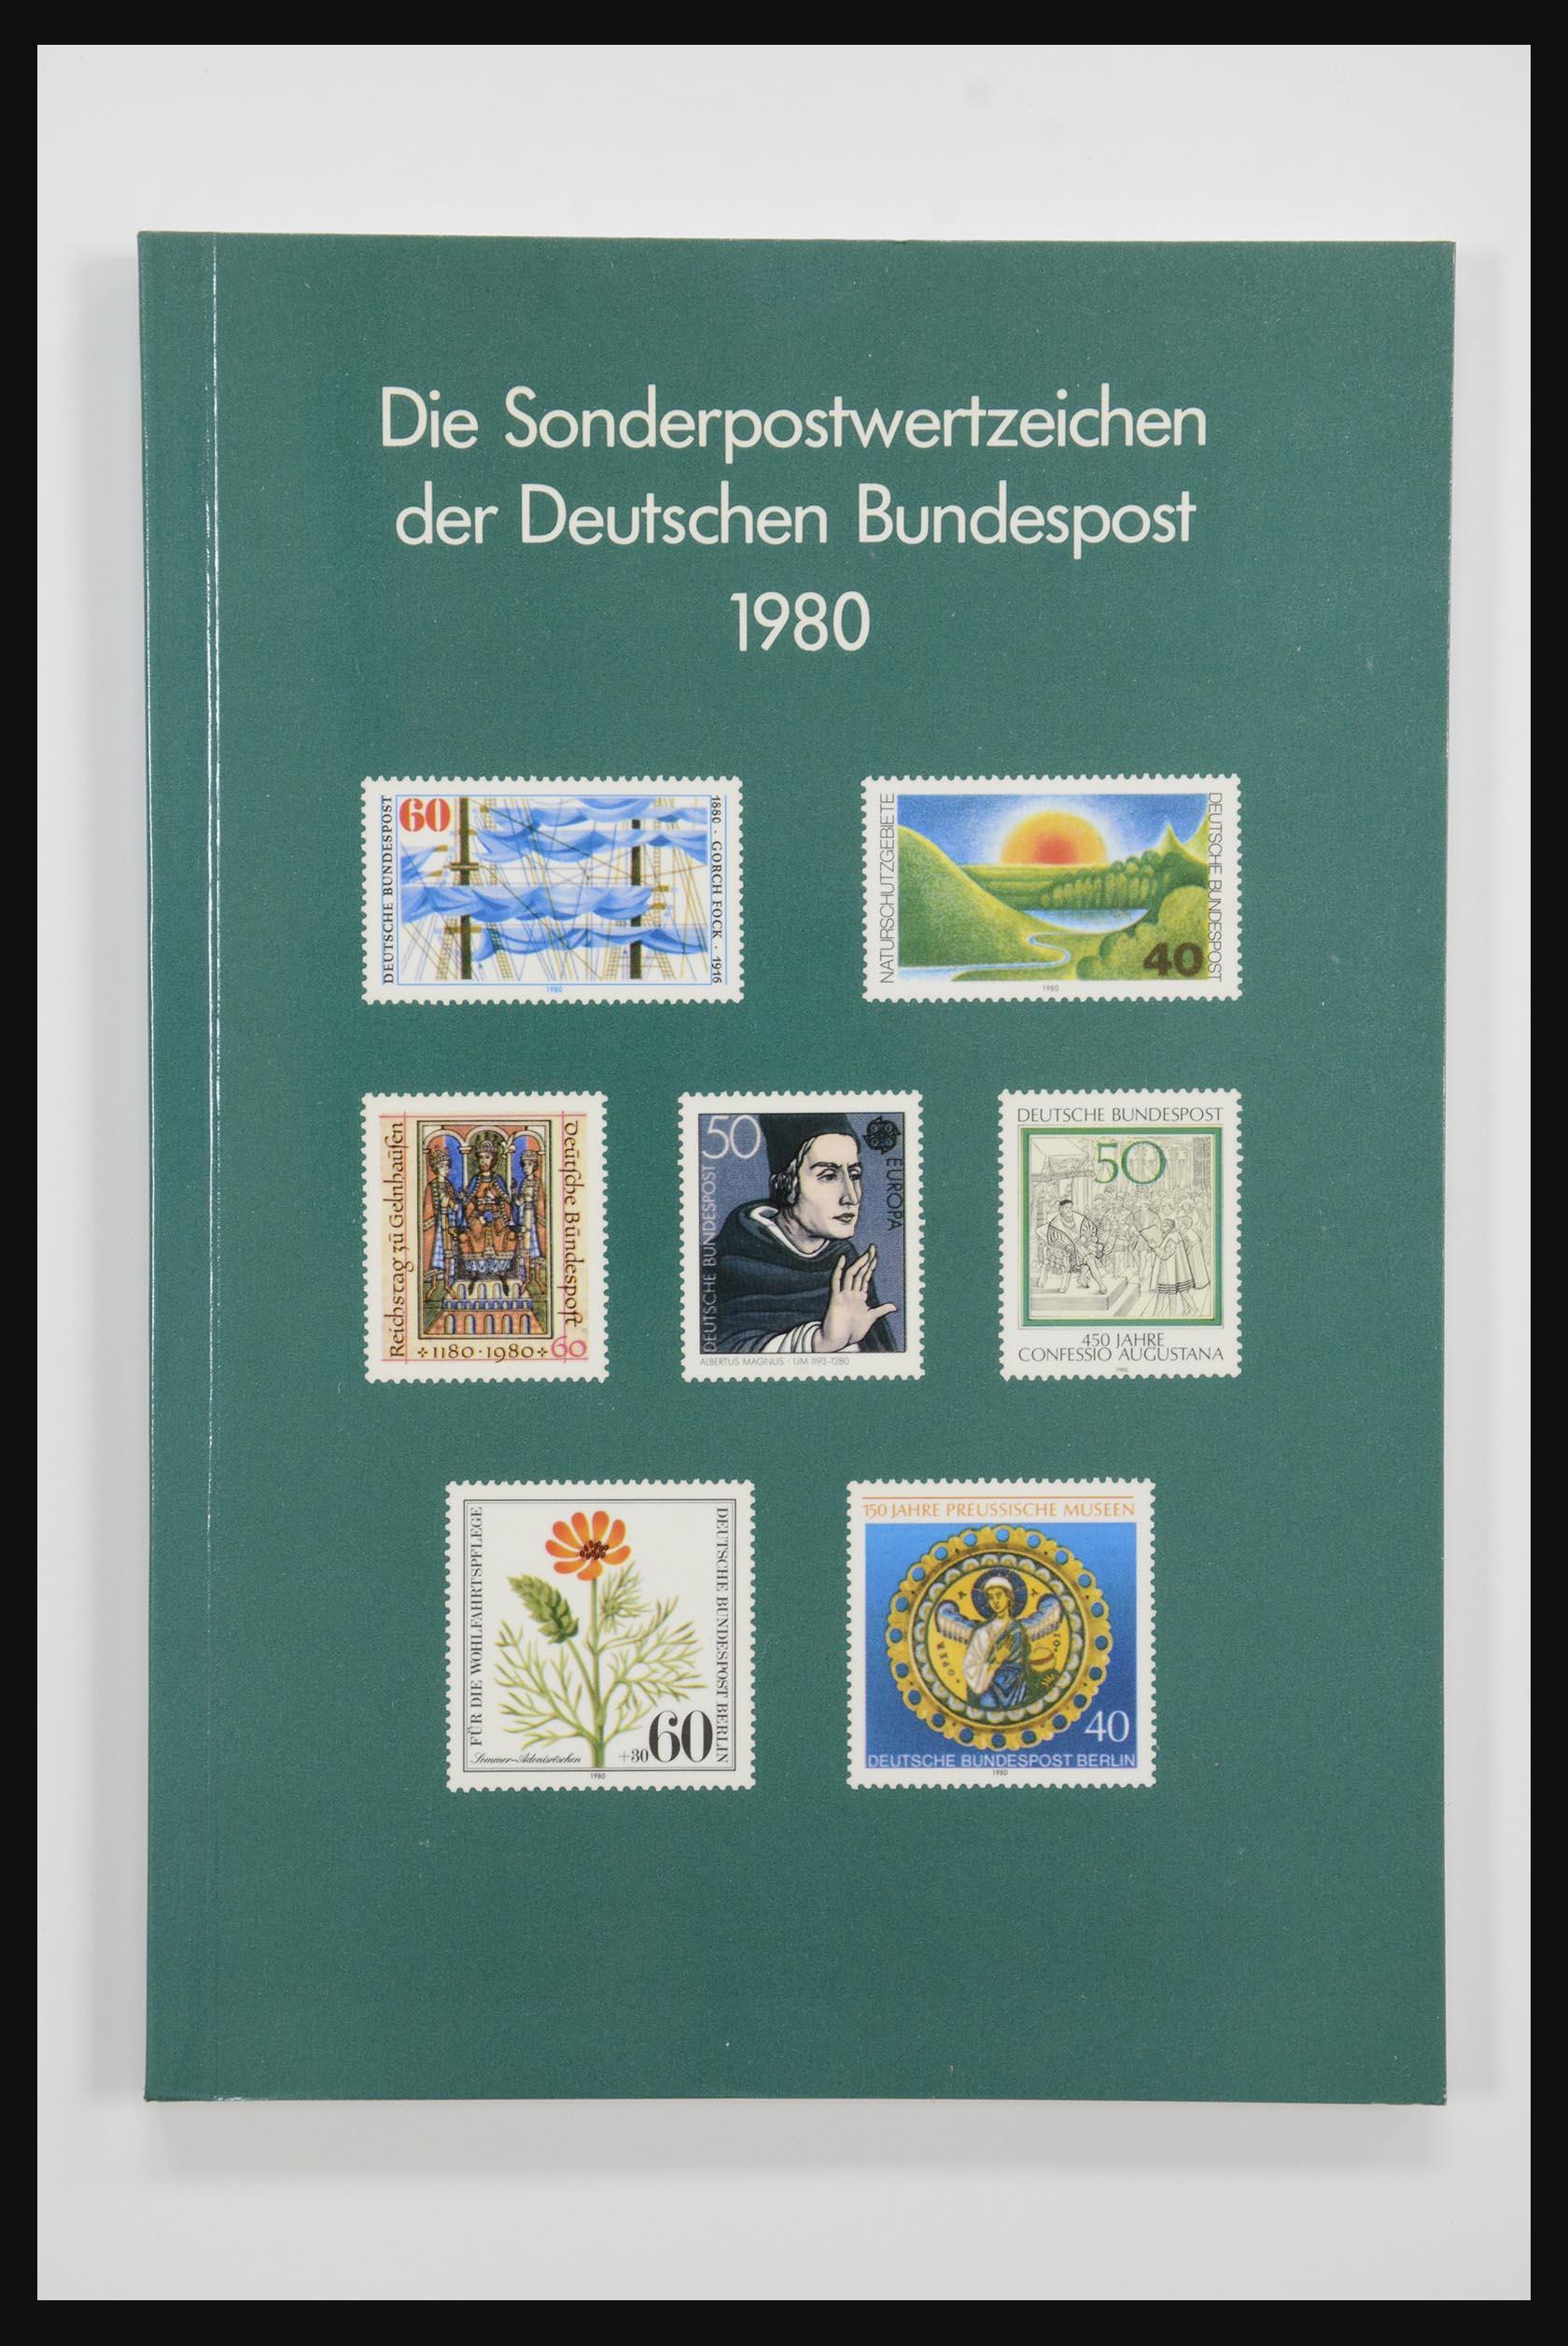 31834 008 - 31834 Bundespost yearbooks 1973(!)-1999.